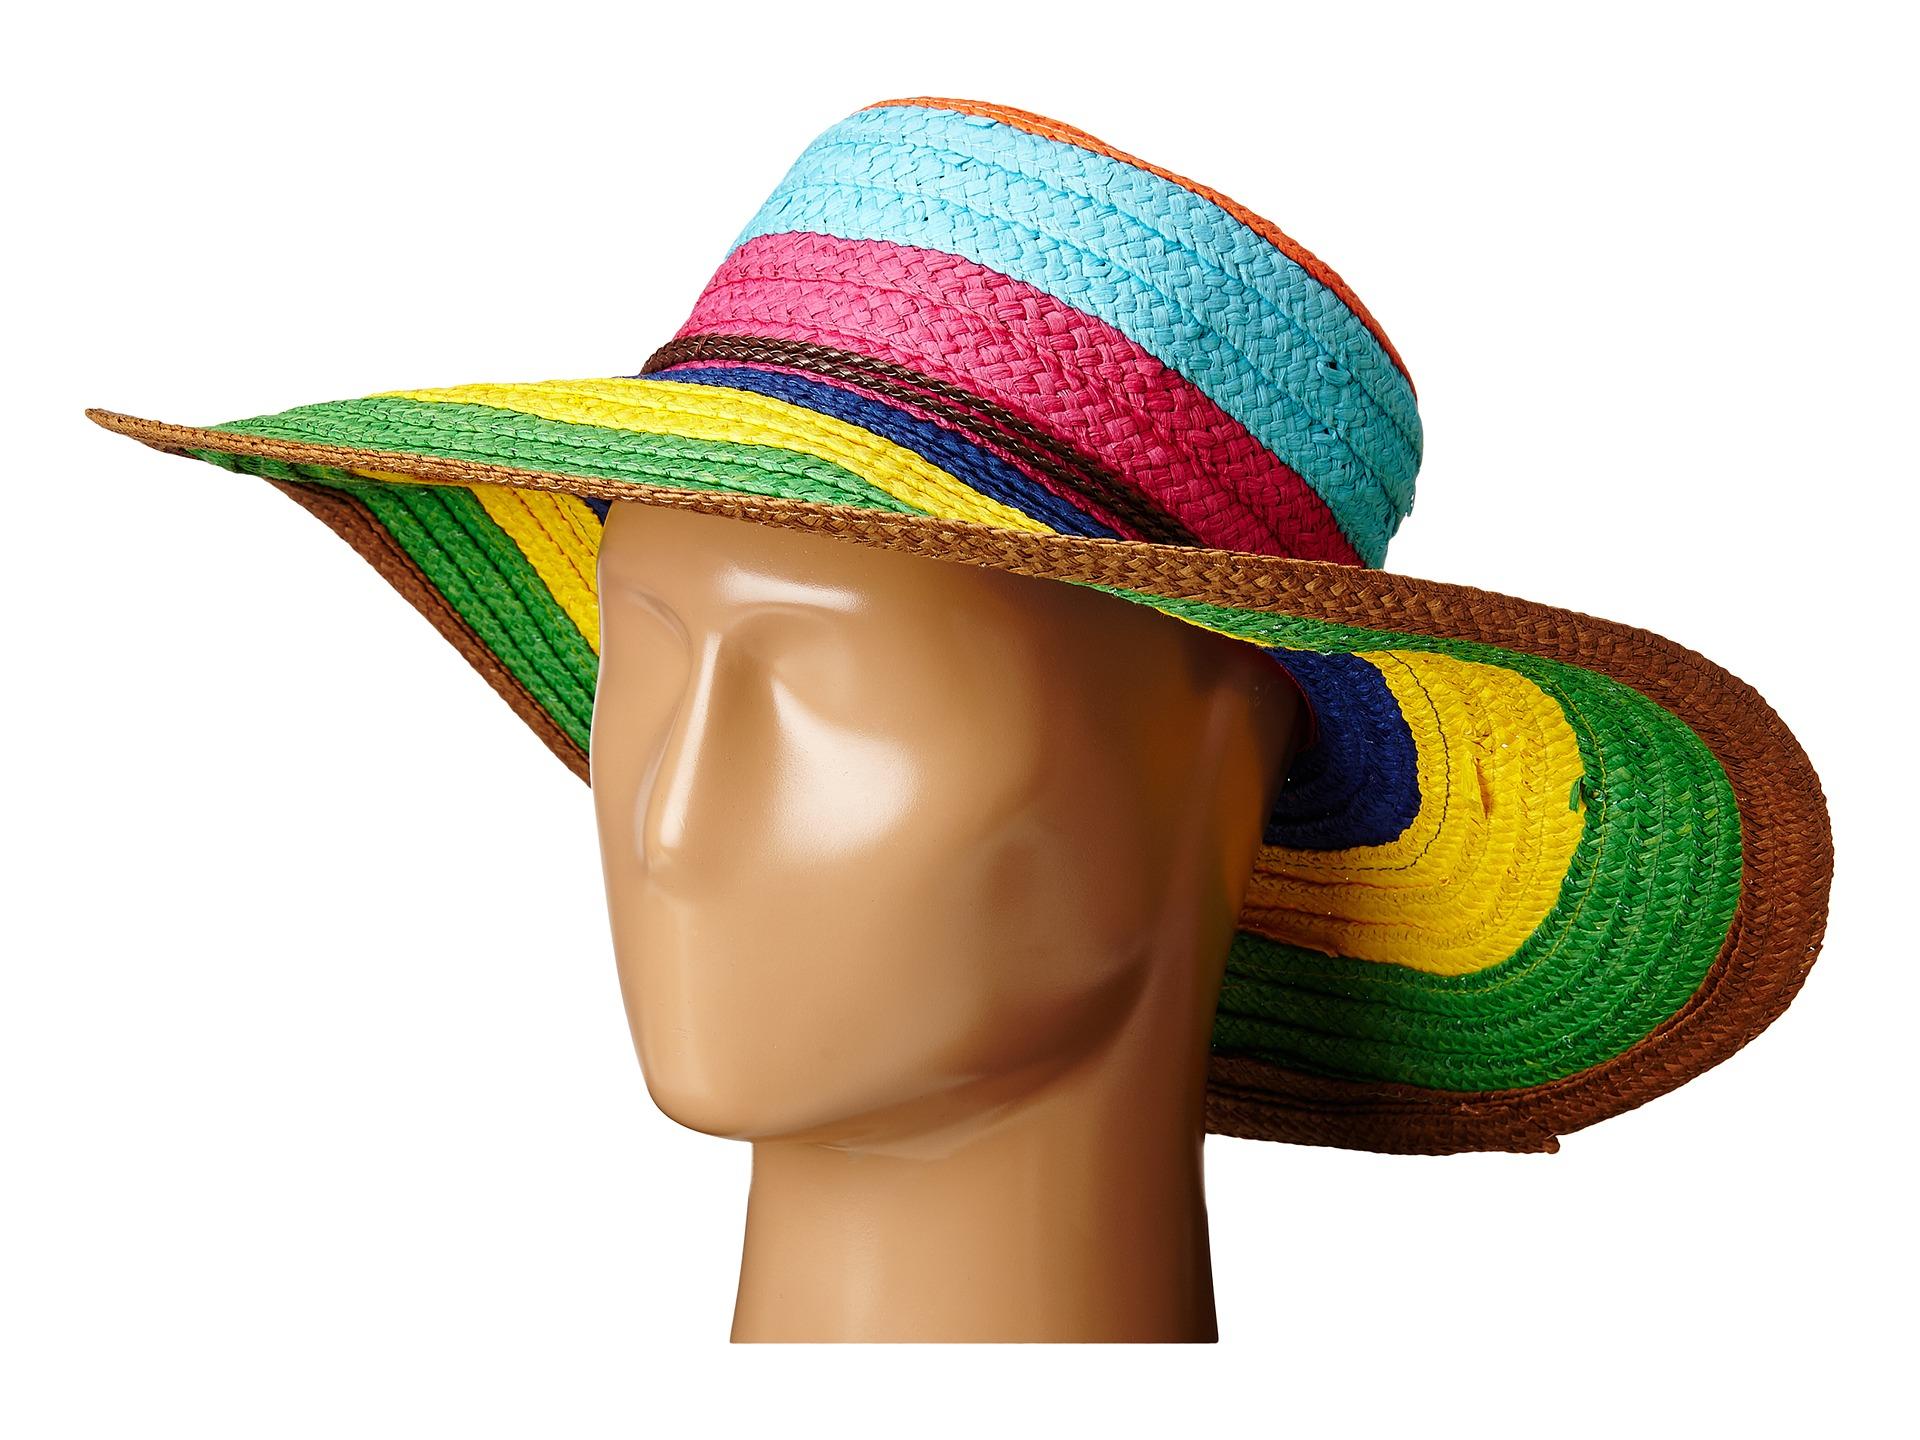 San Diego Hat Company Pbl3071 Striped Sun Brim Hat In